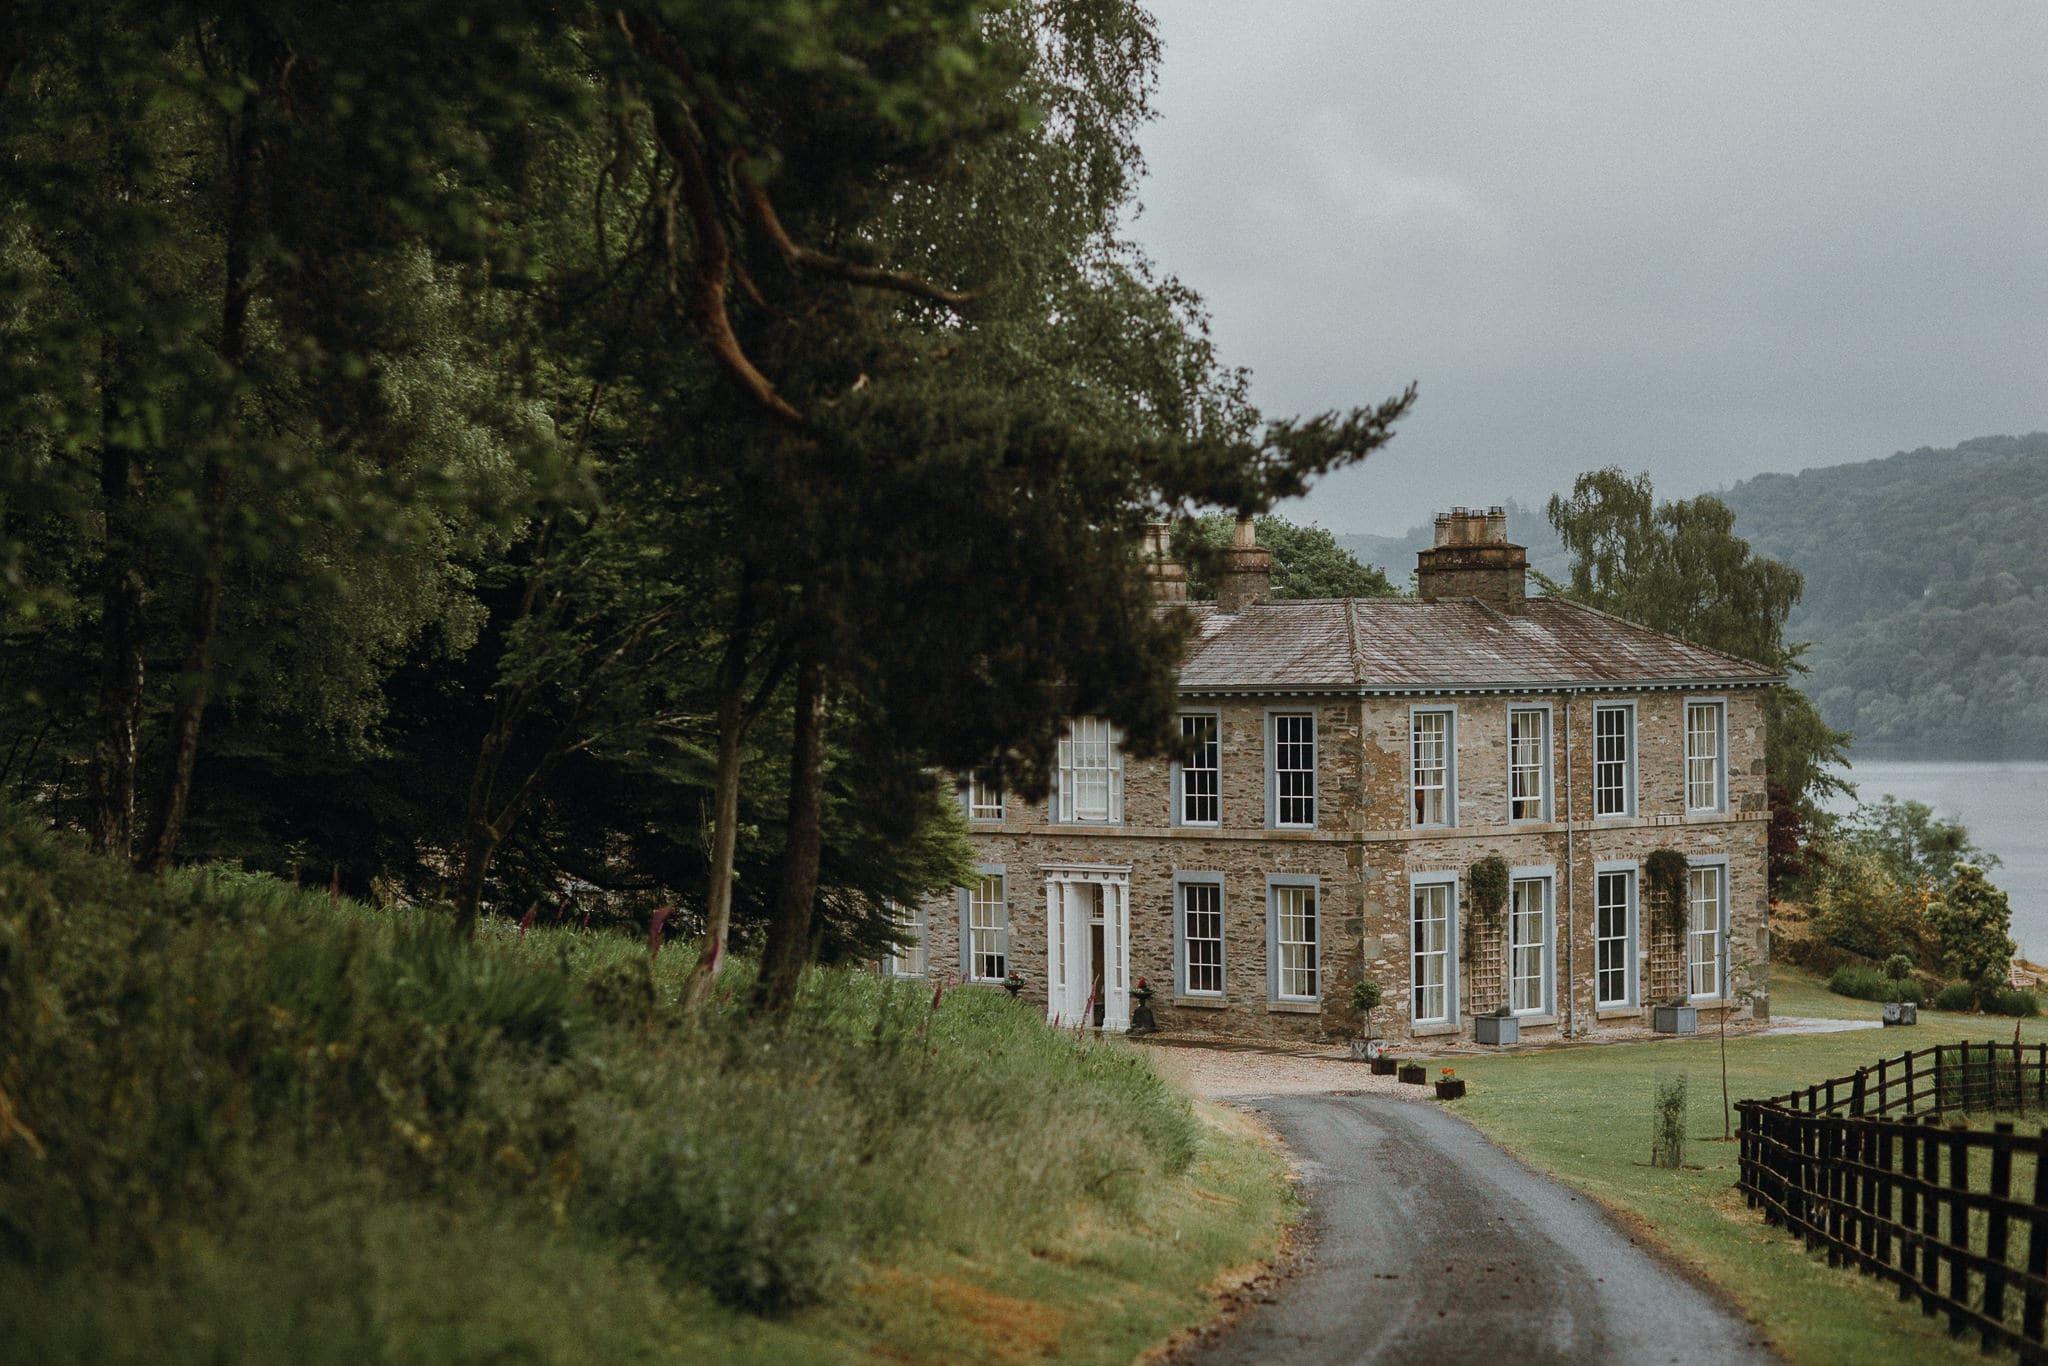 Silverholme Manor Grounds